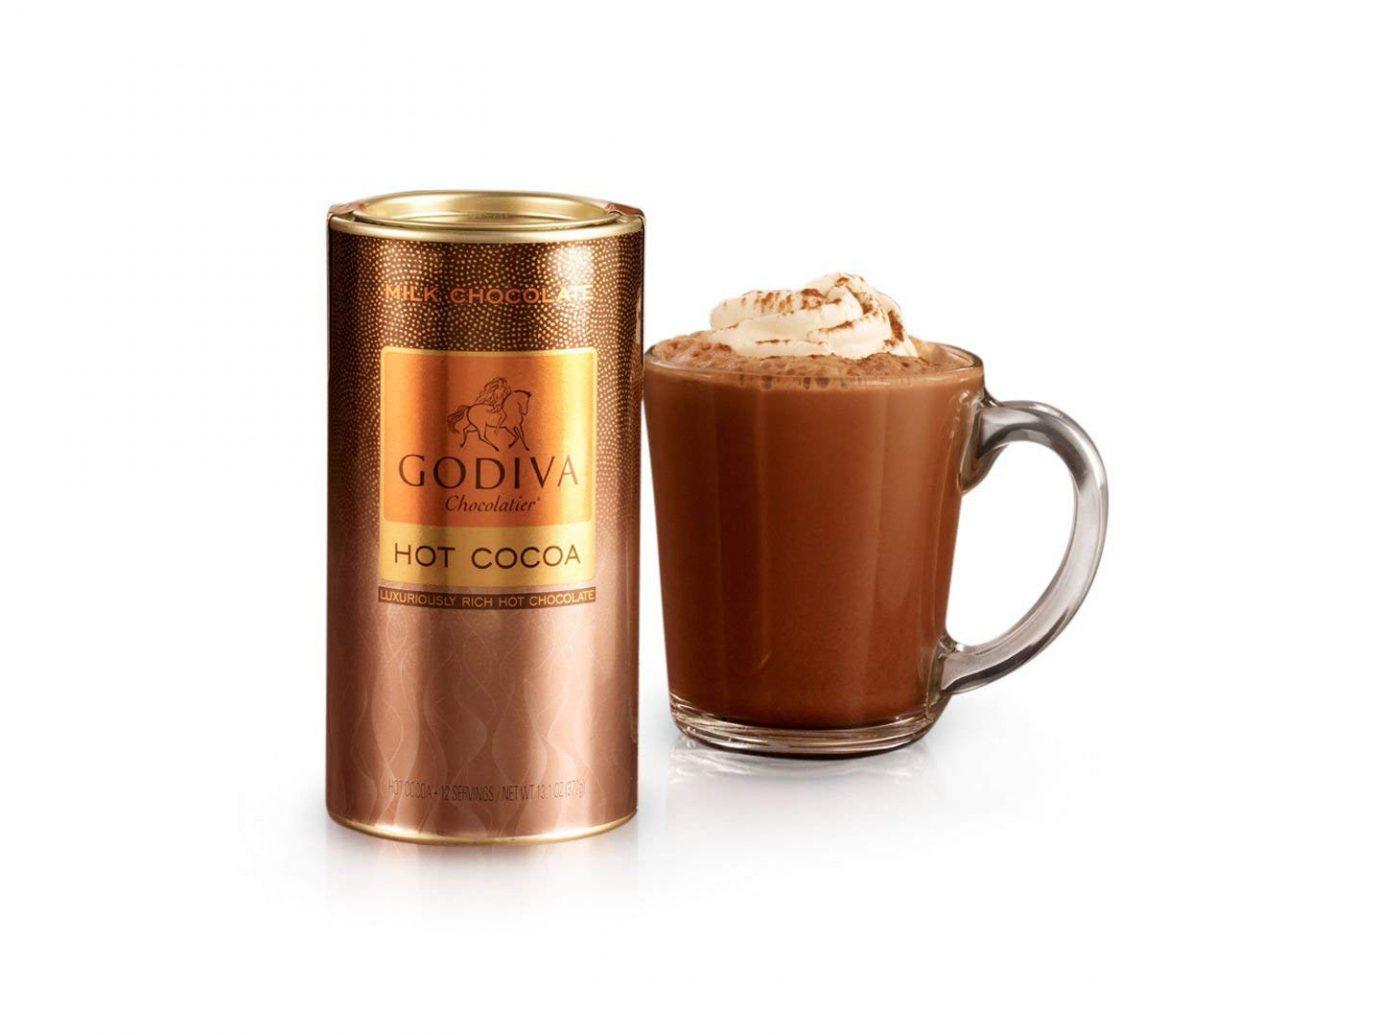 Hot Cocoa: GODIVA Chocolatier Milk Chocolate Hot Cocoa Canister